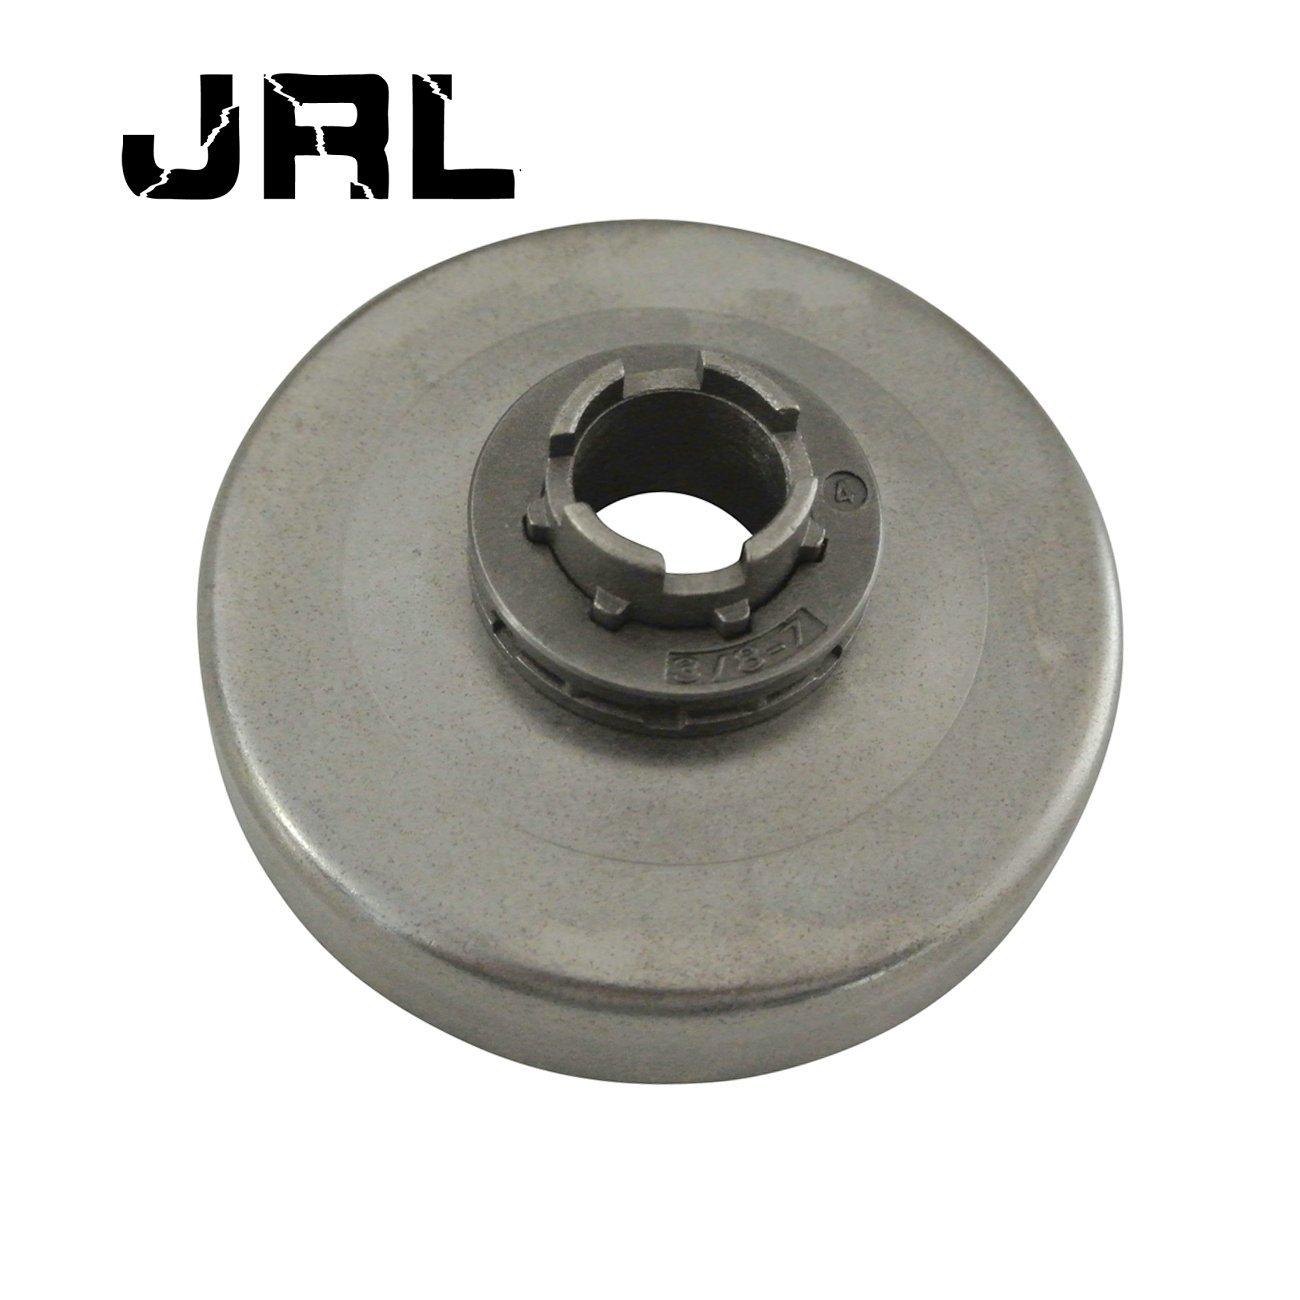 JRL 7T Sprocket Rim Clutch Drum Fit Husqvarna 181 281 285 288 394 2100 Chainsaw Kanglai Machinery